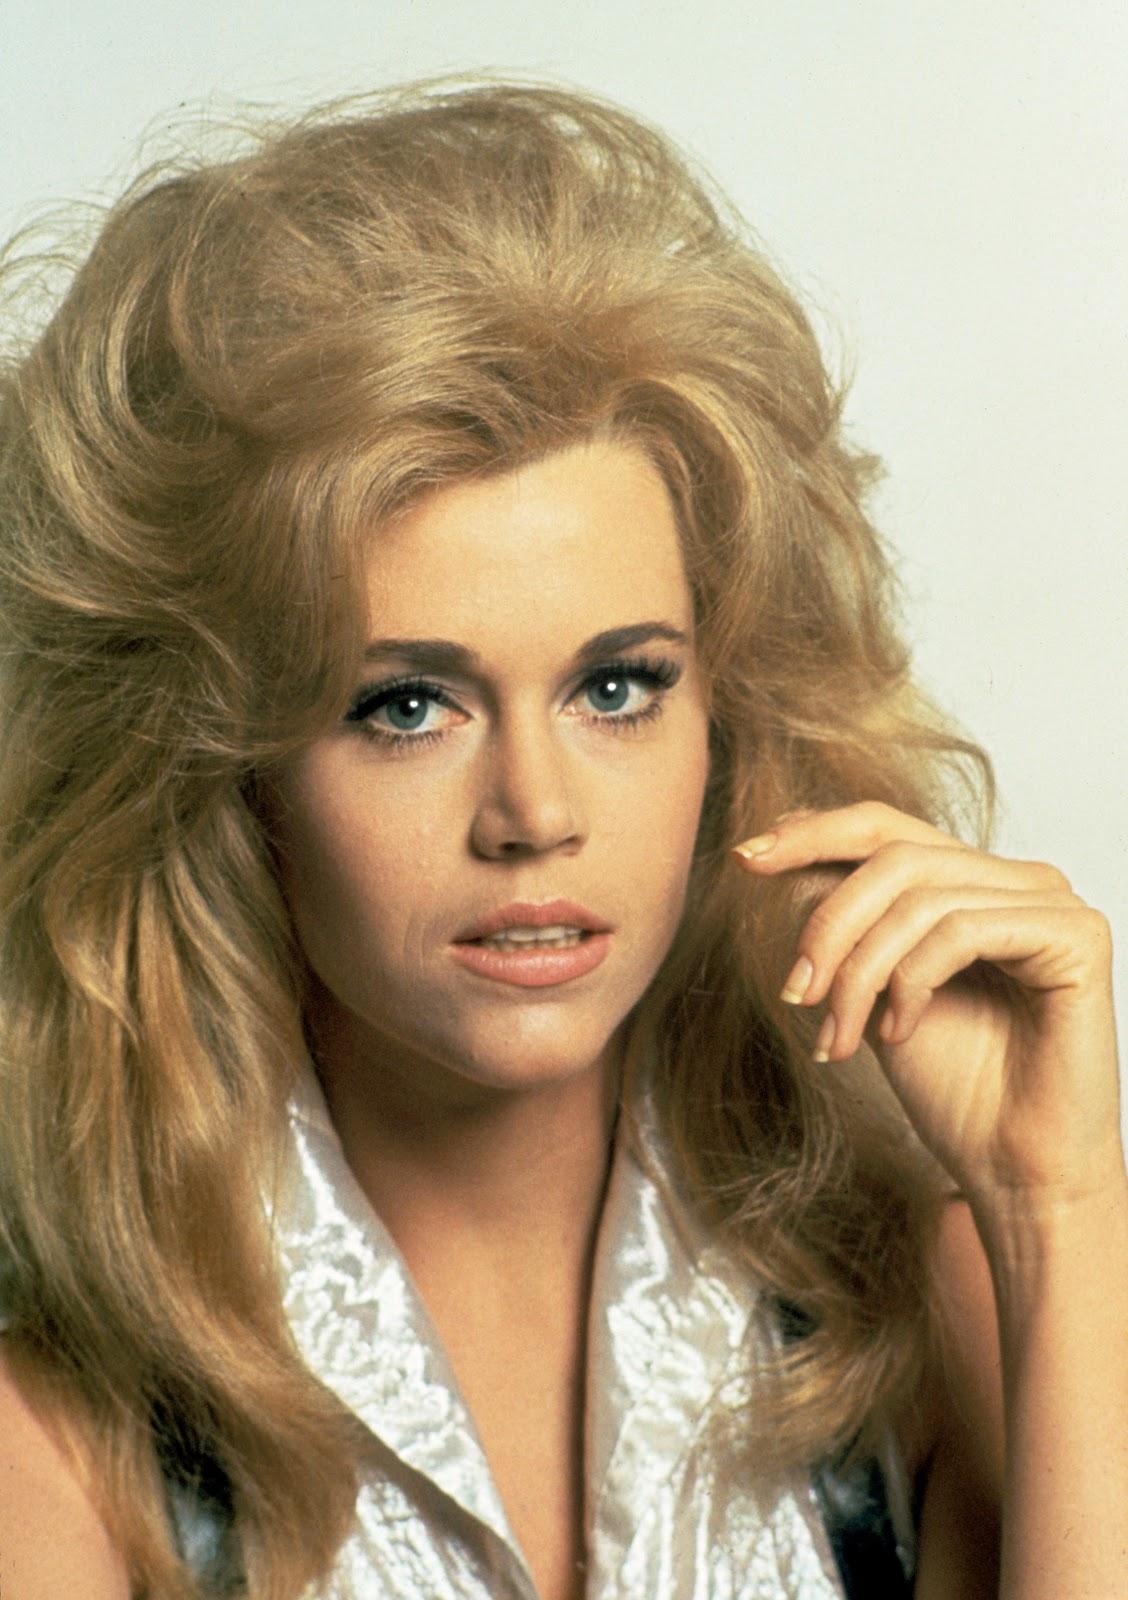 Jane Fonda Photo Portret on 2011 03 01 Archive